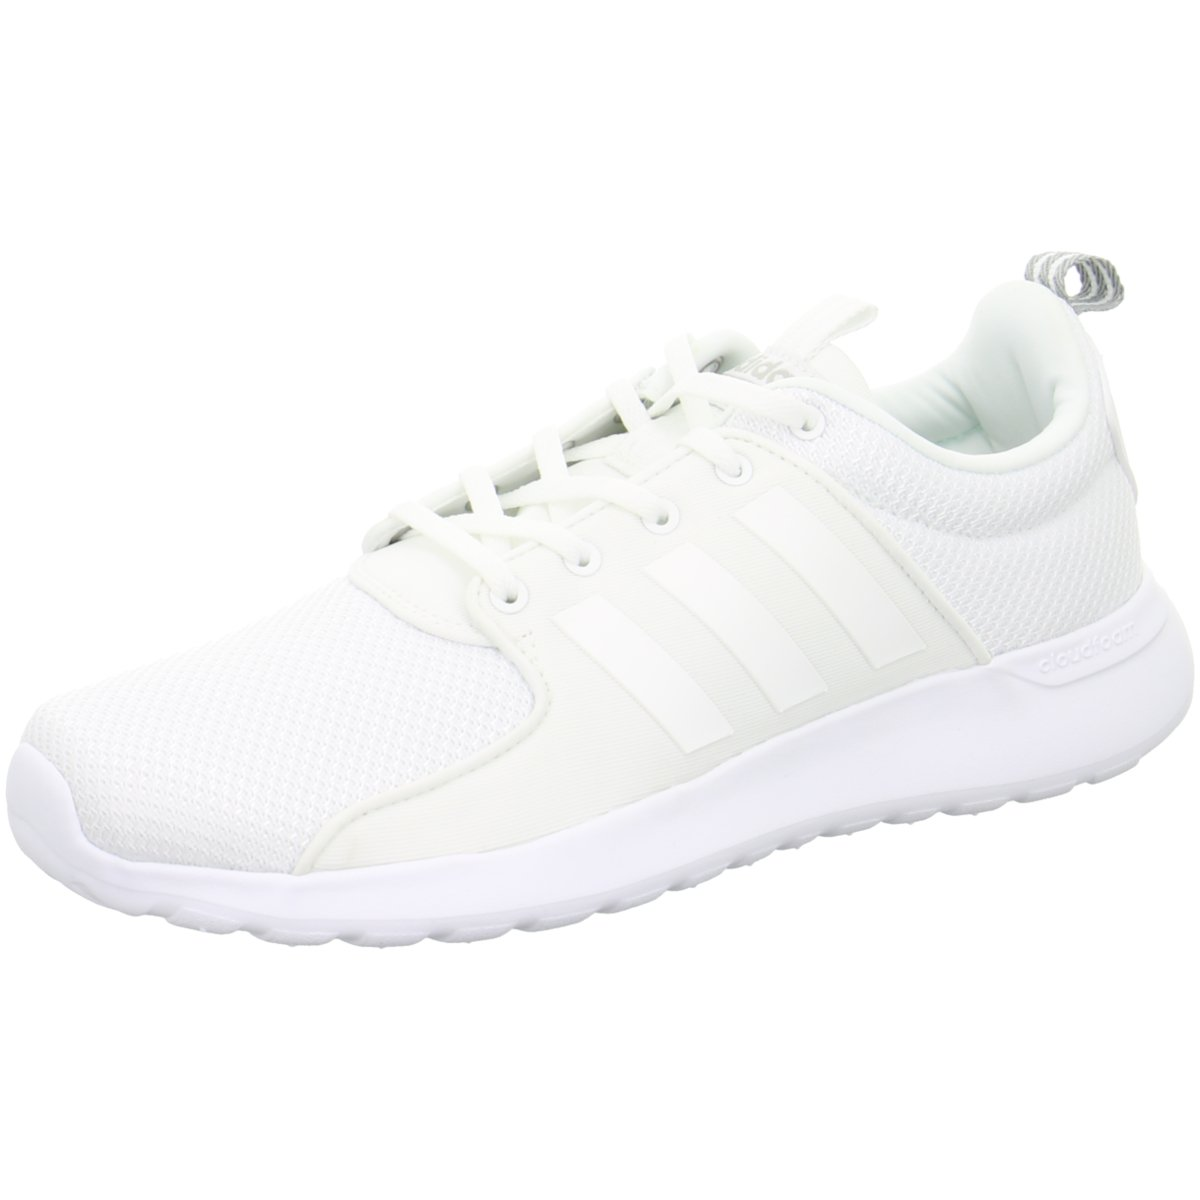 NEU adidas Herren Sneaker Cloudfoam Lite R AW4262 weiß 214312